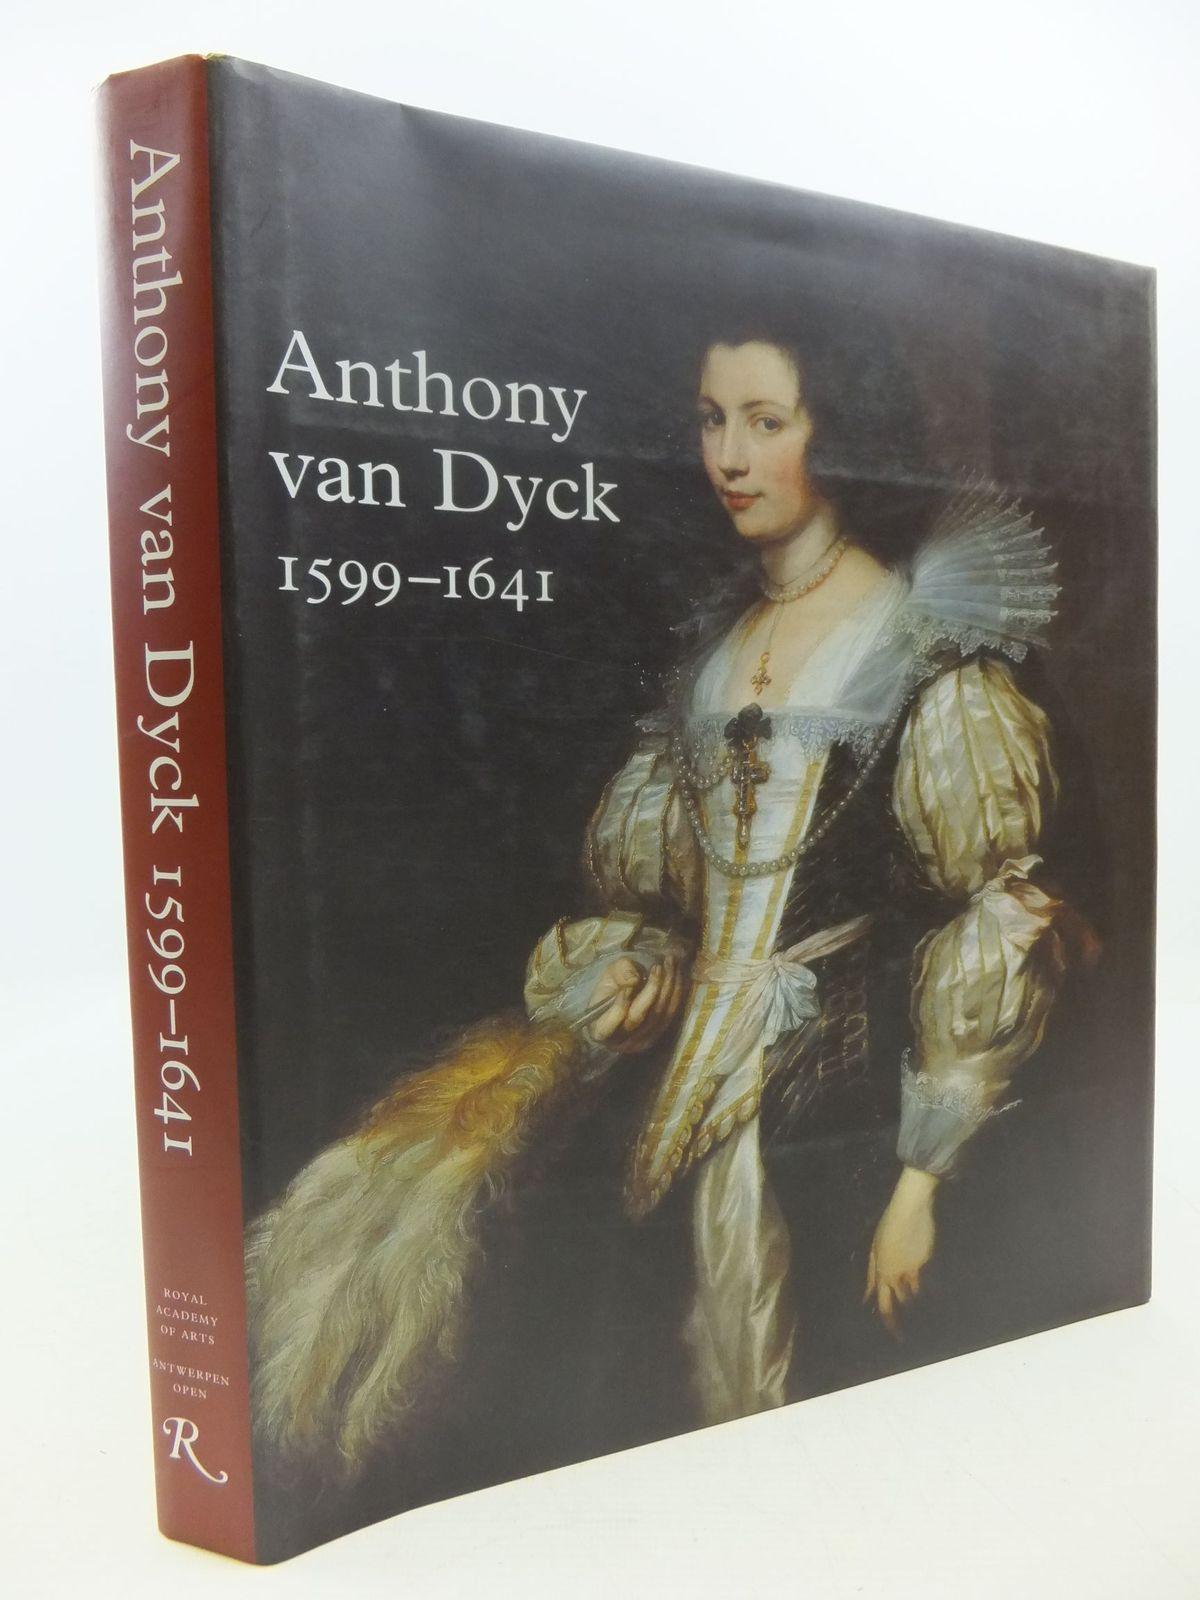 Photo of VAN DYCK 1599-1641